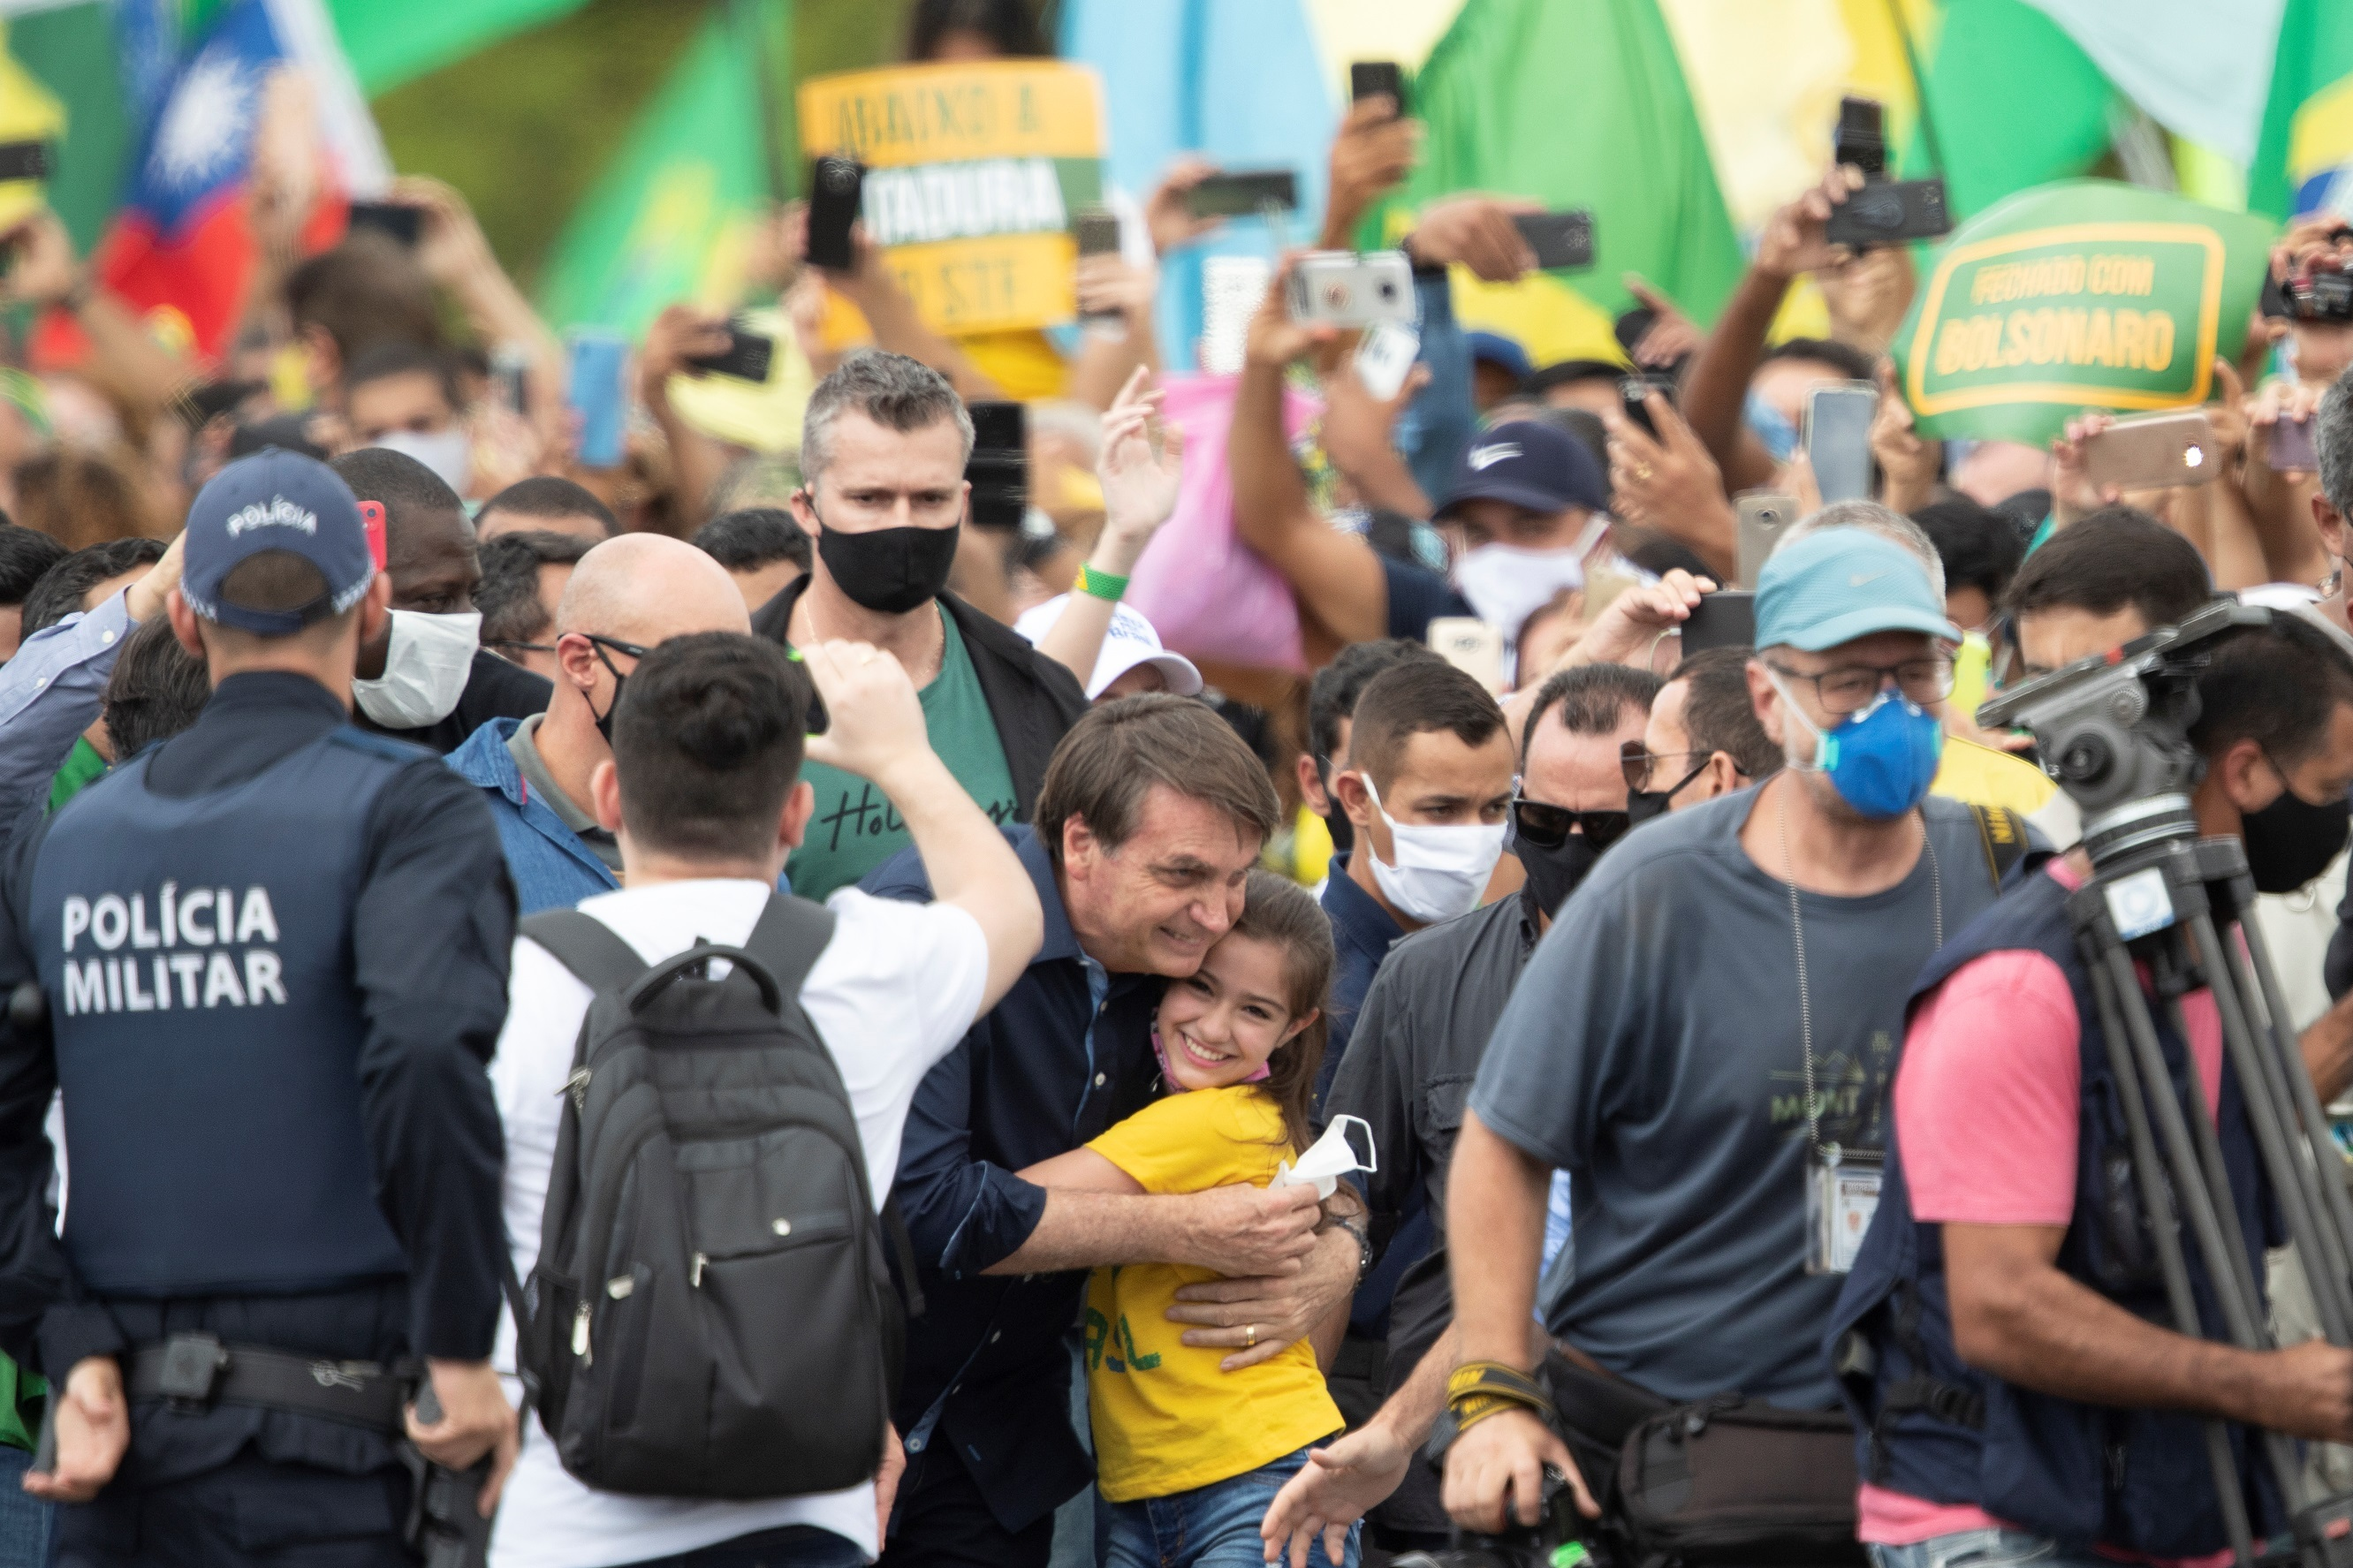 El presidente de Brasil, Jair Bolsonaro, saluda a una niña este domingo, en Brasilia (Brasil), sin ninguna medida de aislamiento social. EFE/Joédson Alves